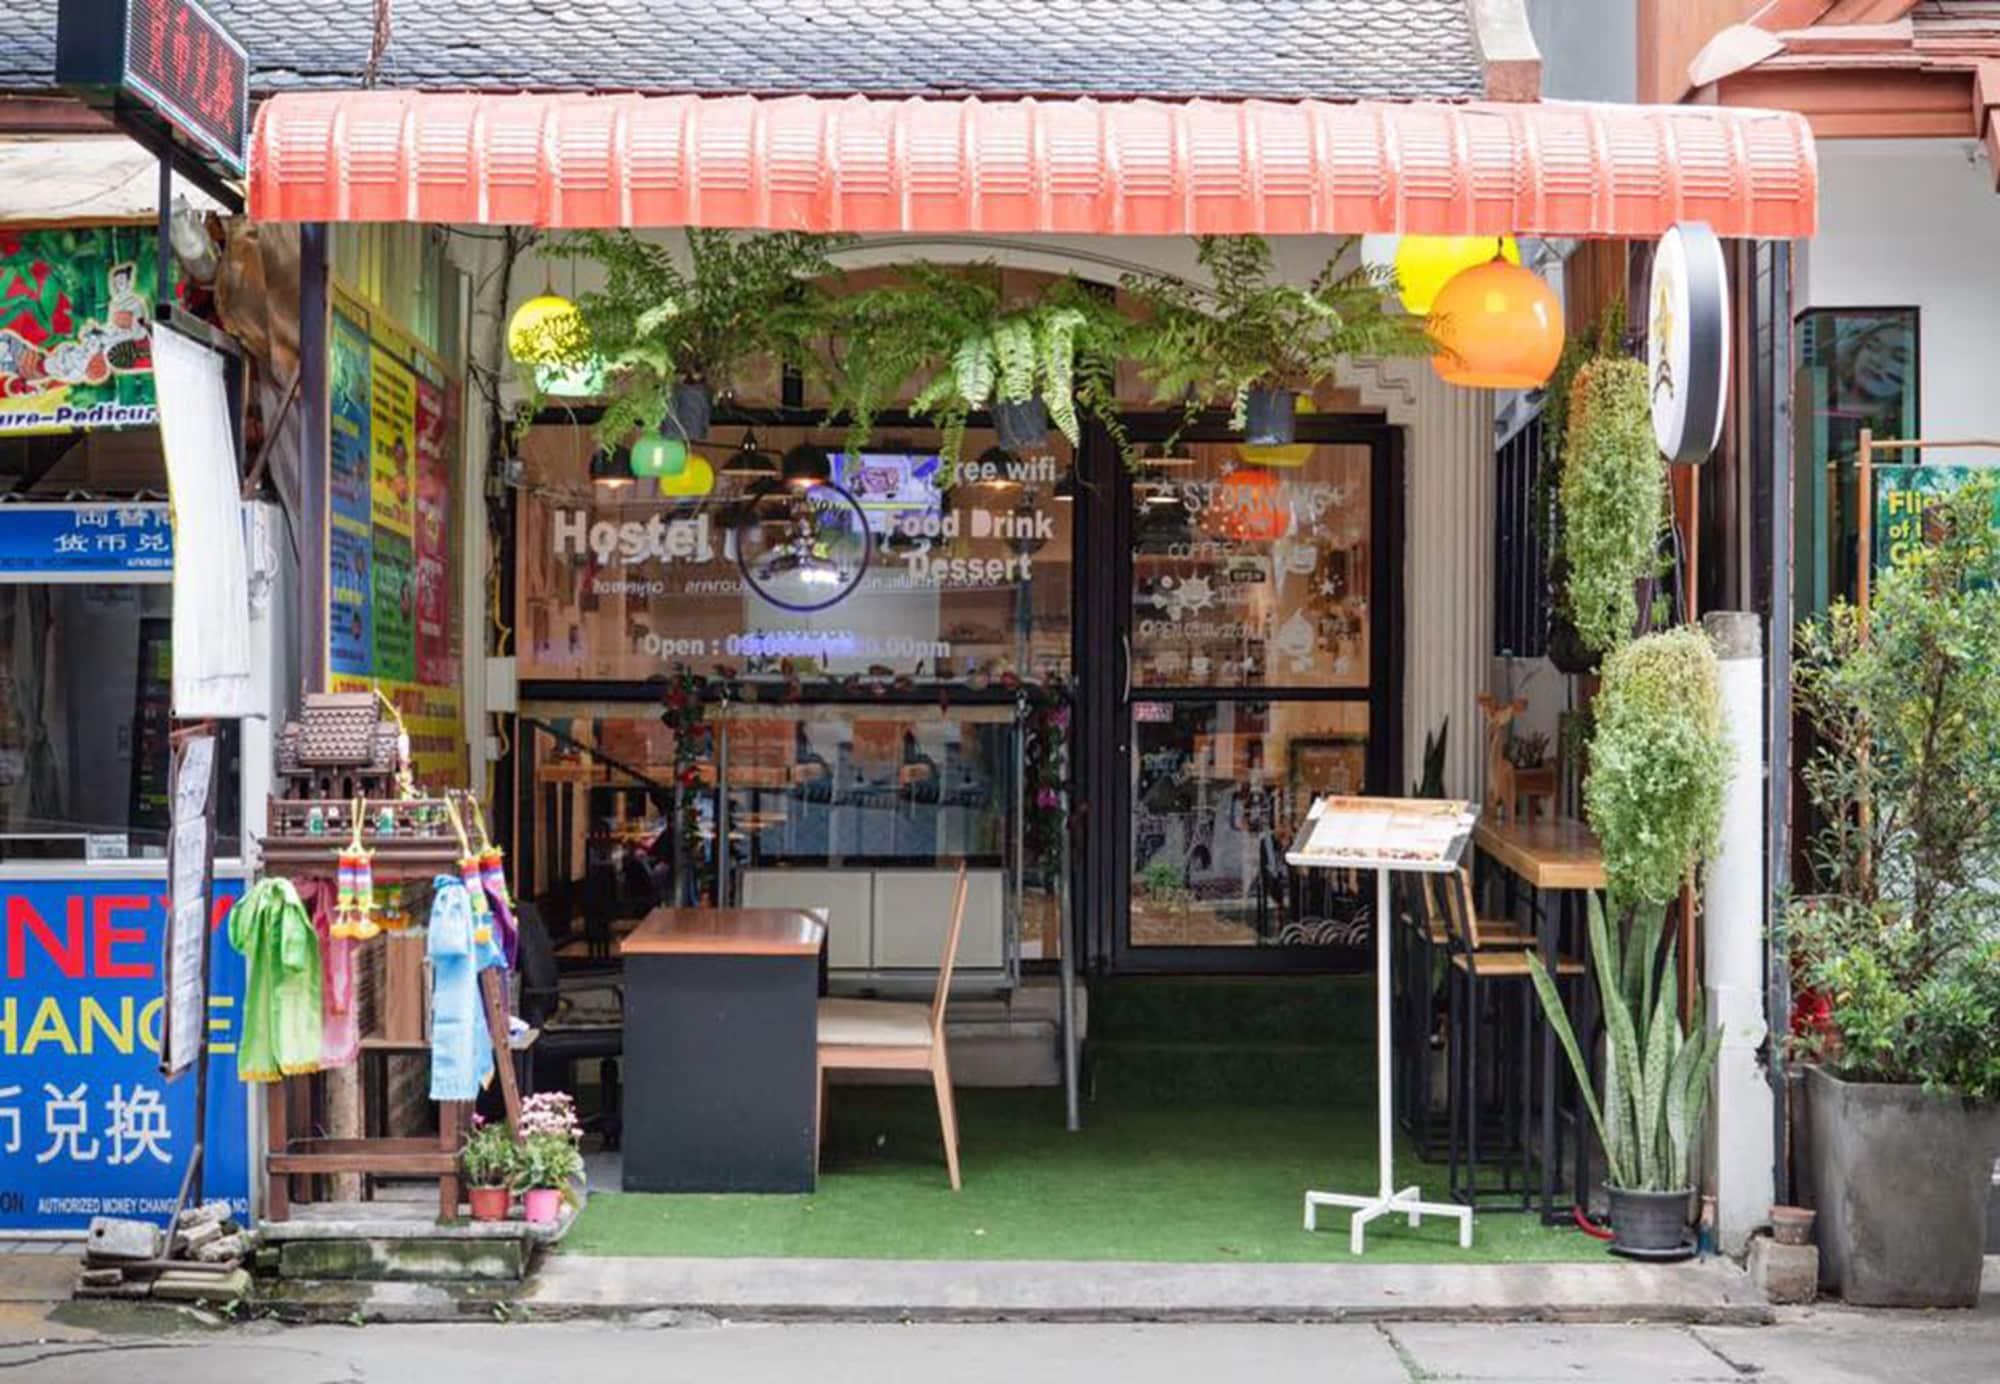 Starnong Café & Hostel, Muang Chiang Mai